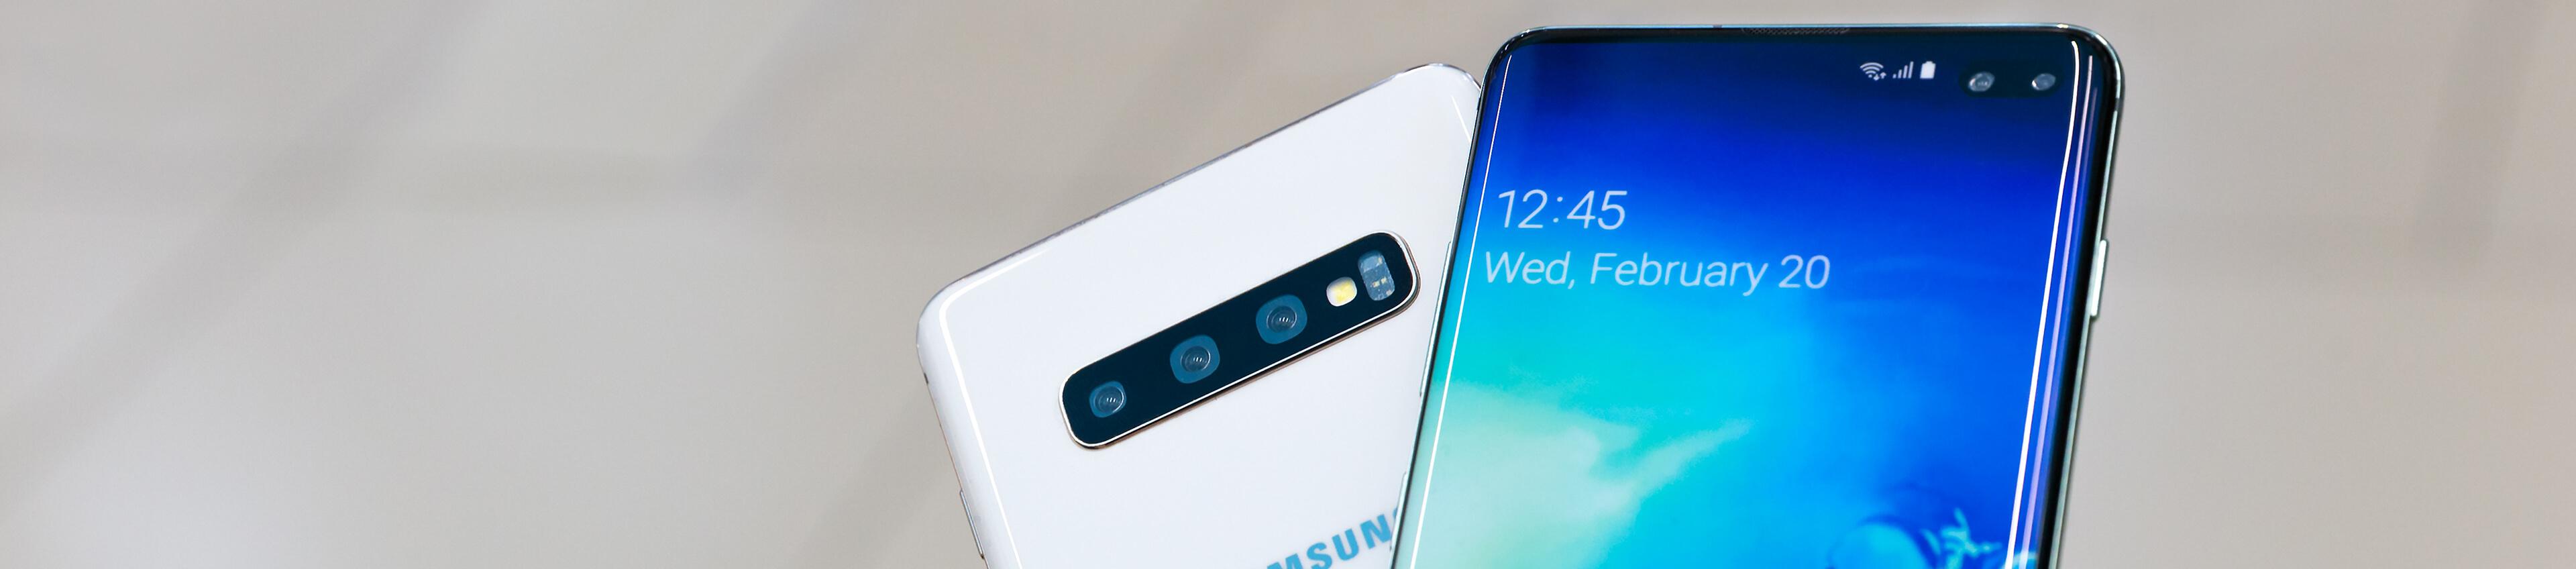 Samsung Galaxy S10 Black Friday